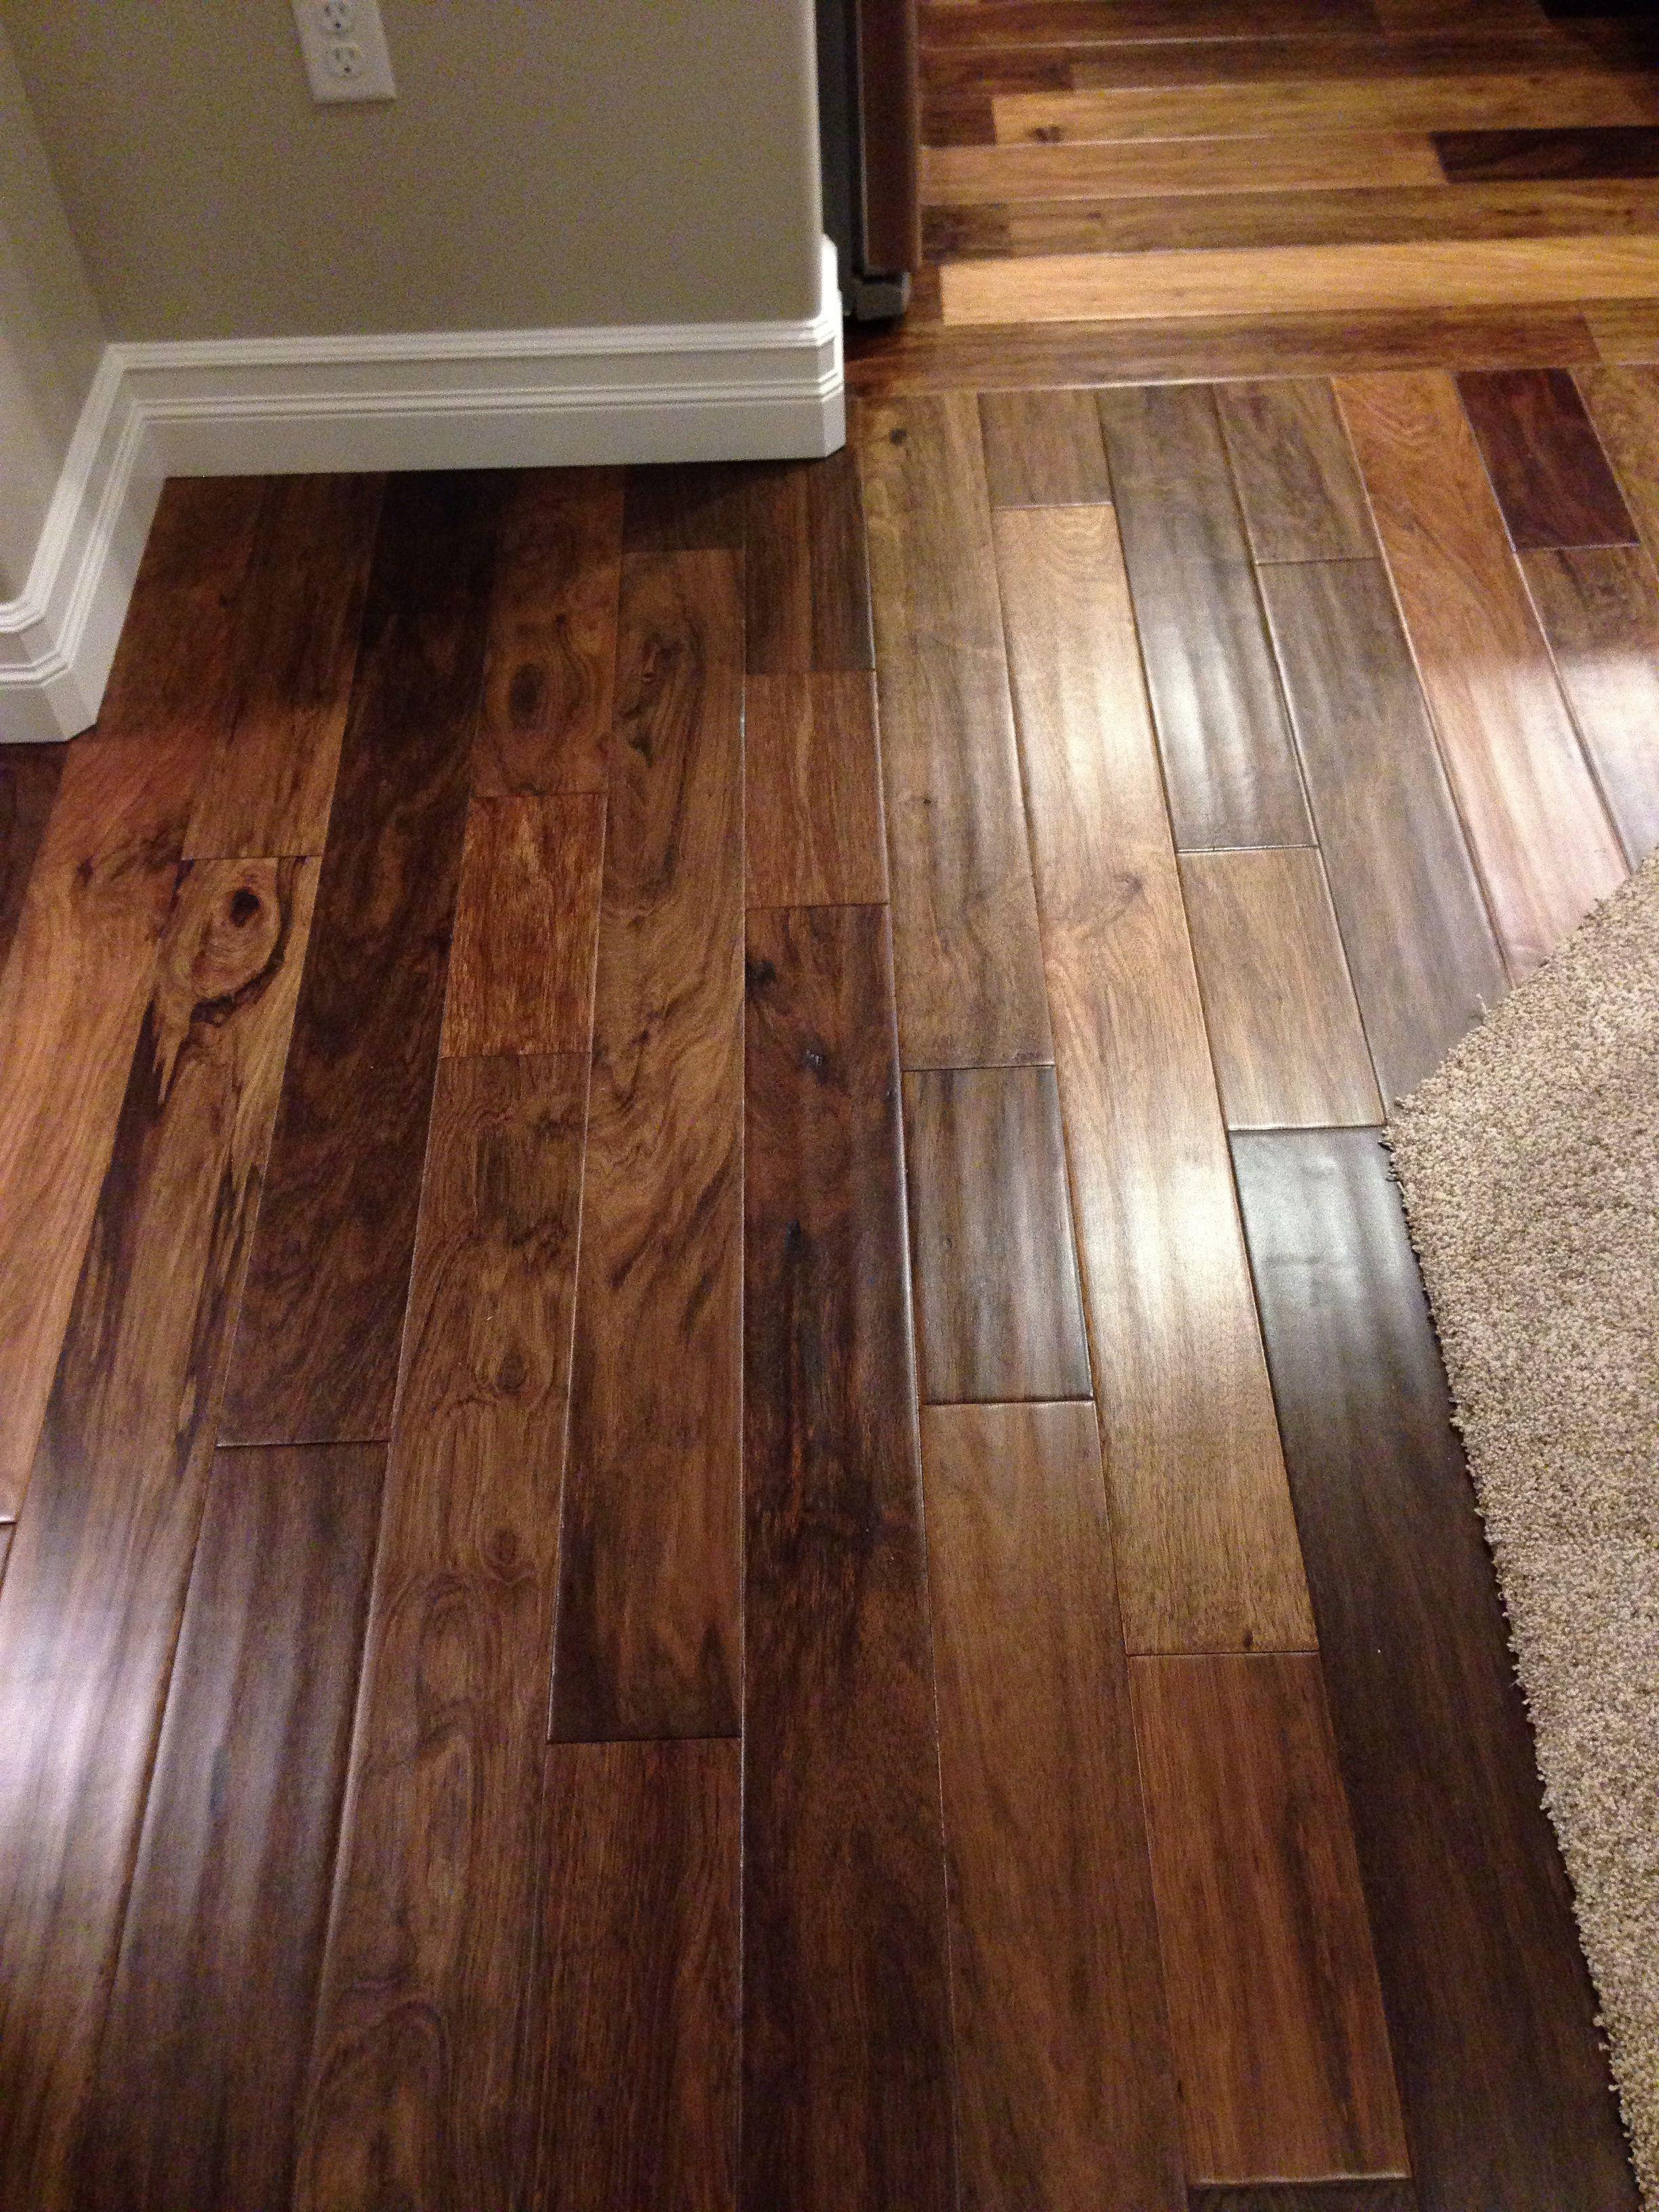 cost to install floating engineered hardwood floor of african ebony engineered wood floor by mohawk 5 inch plank hand for african ebony engineered wood floor by mohawk 5 inch plank hand scraped would